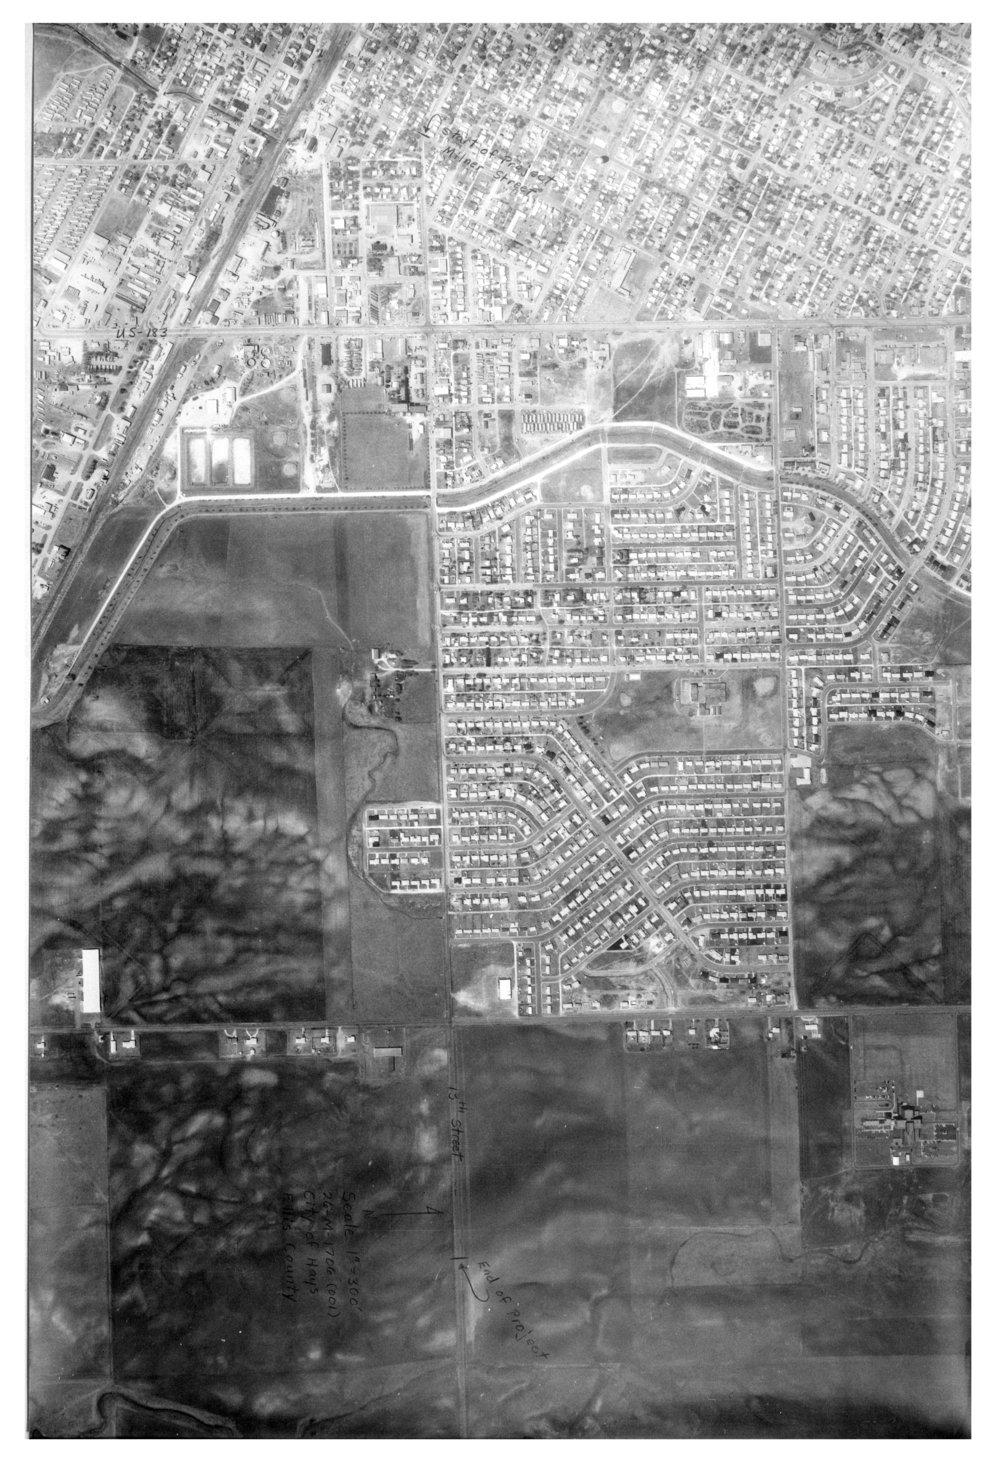 Aerial view, Hays, Kansas